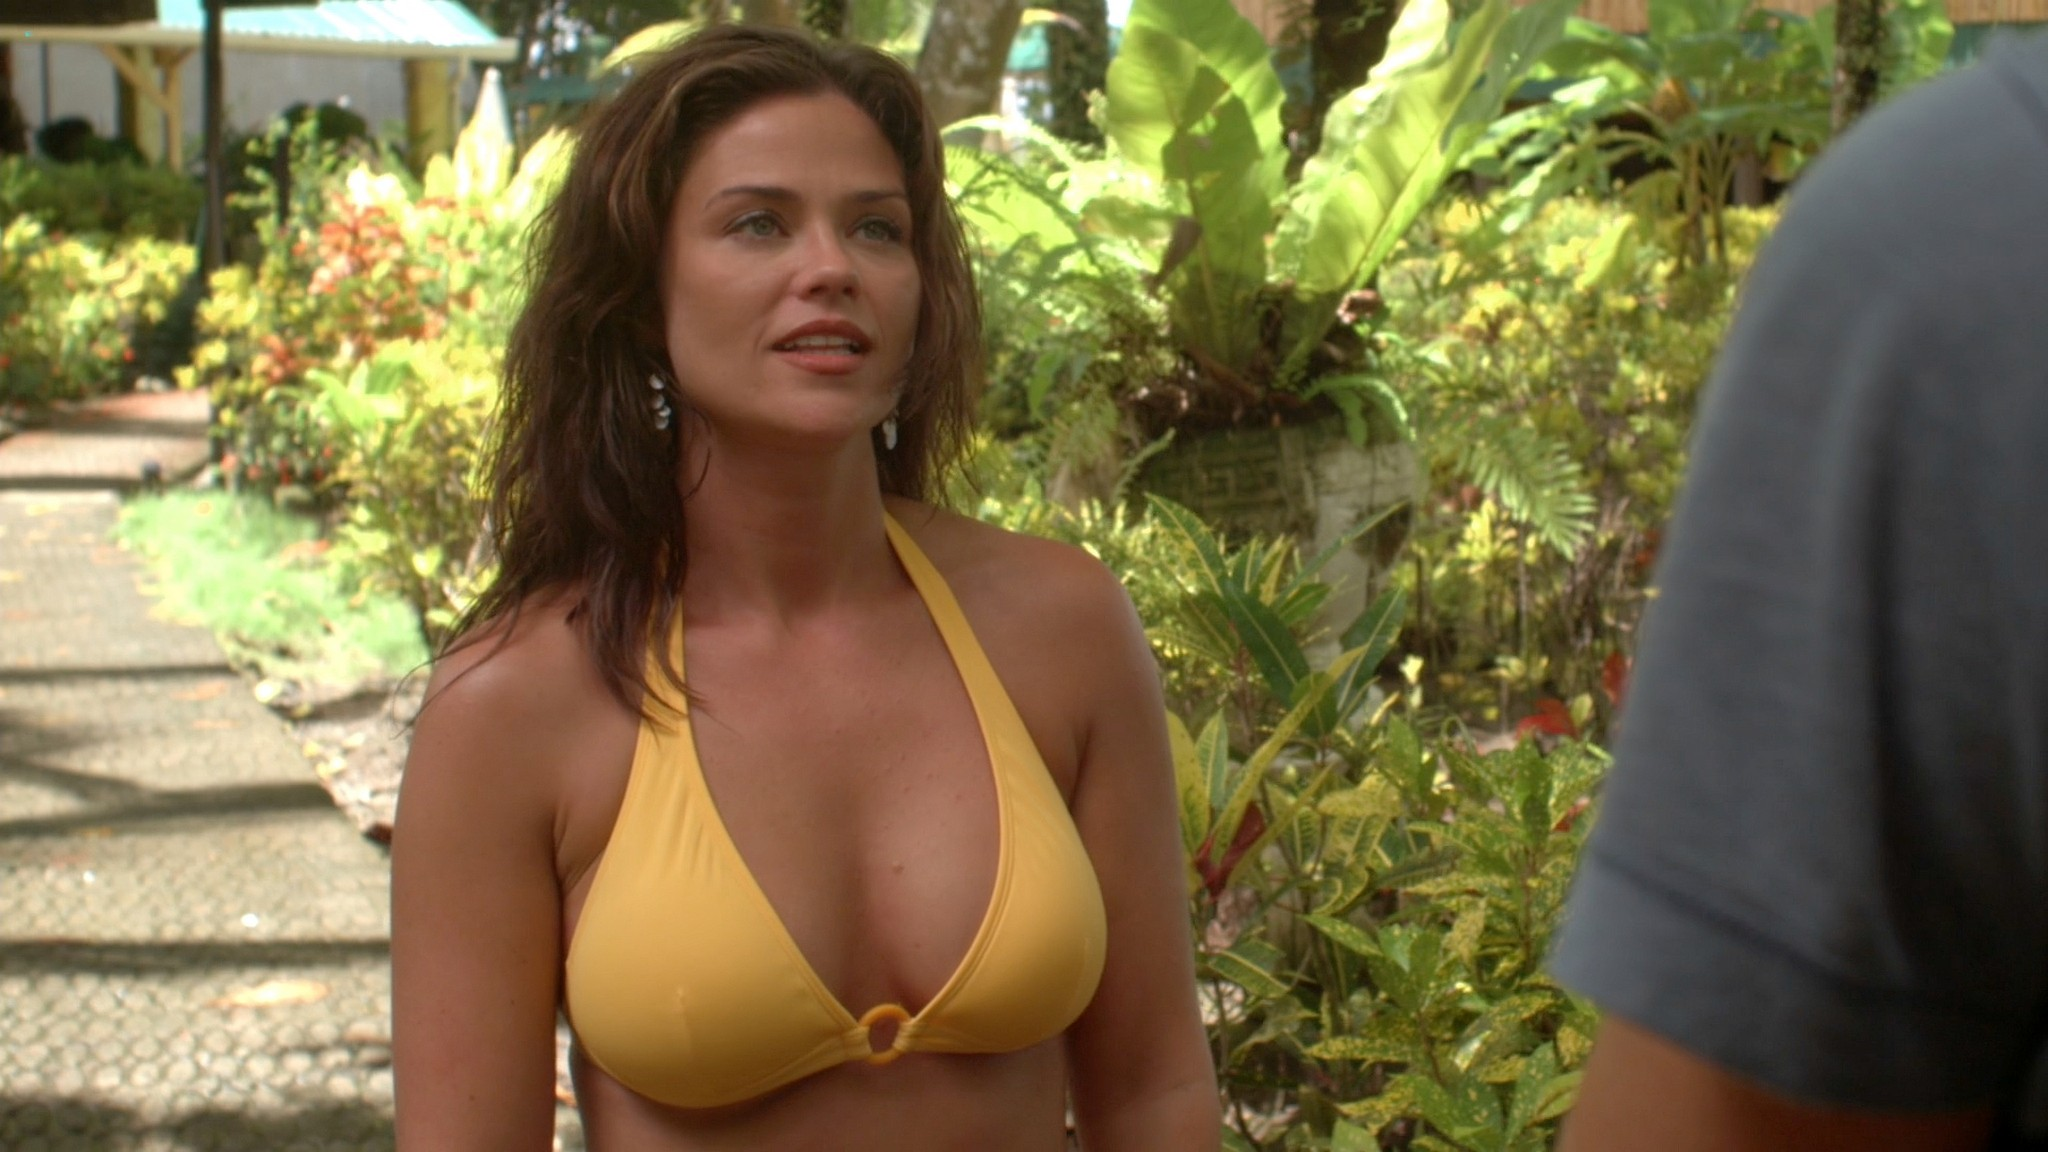 Dana Kollar and Sheila Platte nude topless Julianna Guill and Susan Ward hot Costa Rican Summer 2009 1080p Web